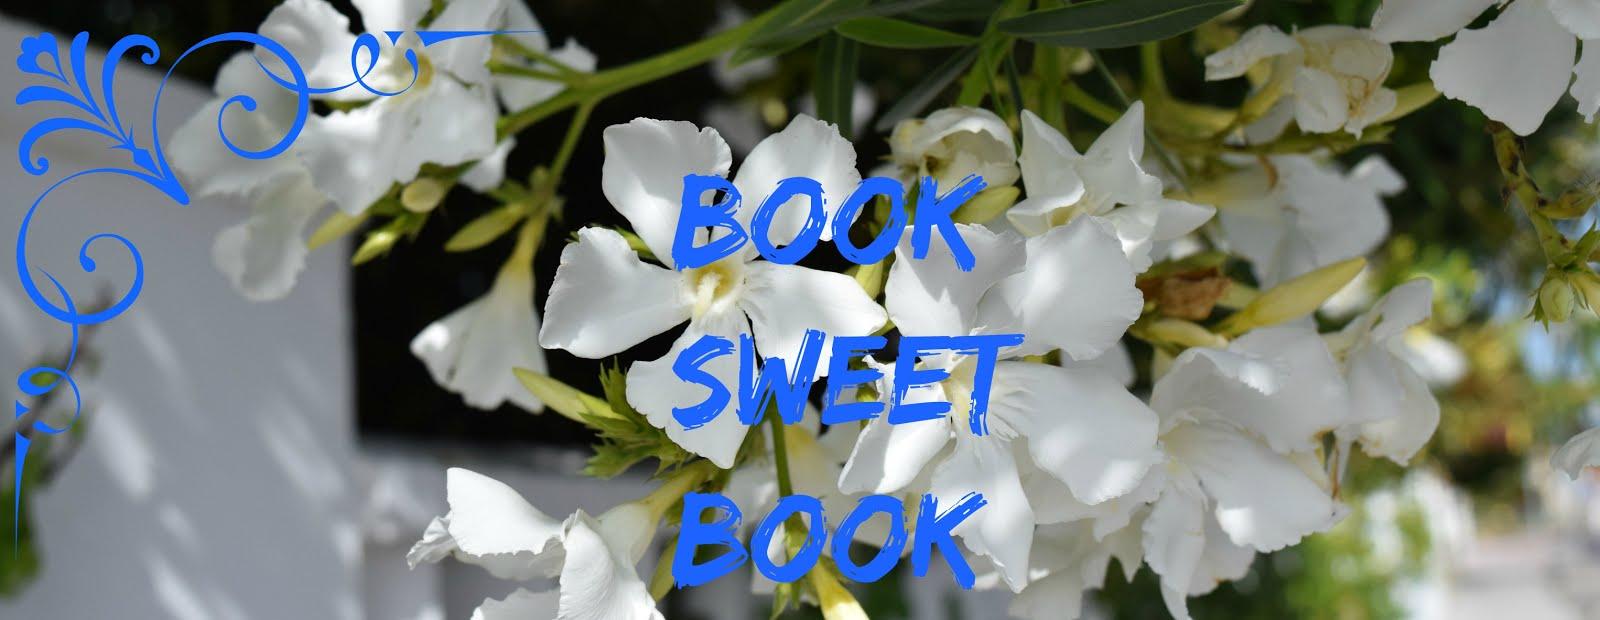 Book sweet book